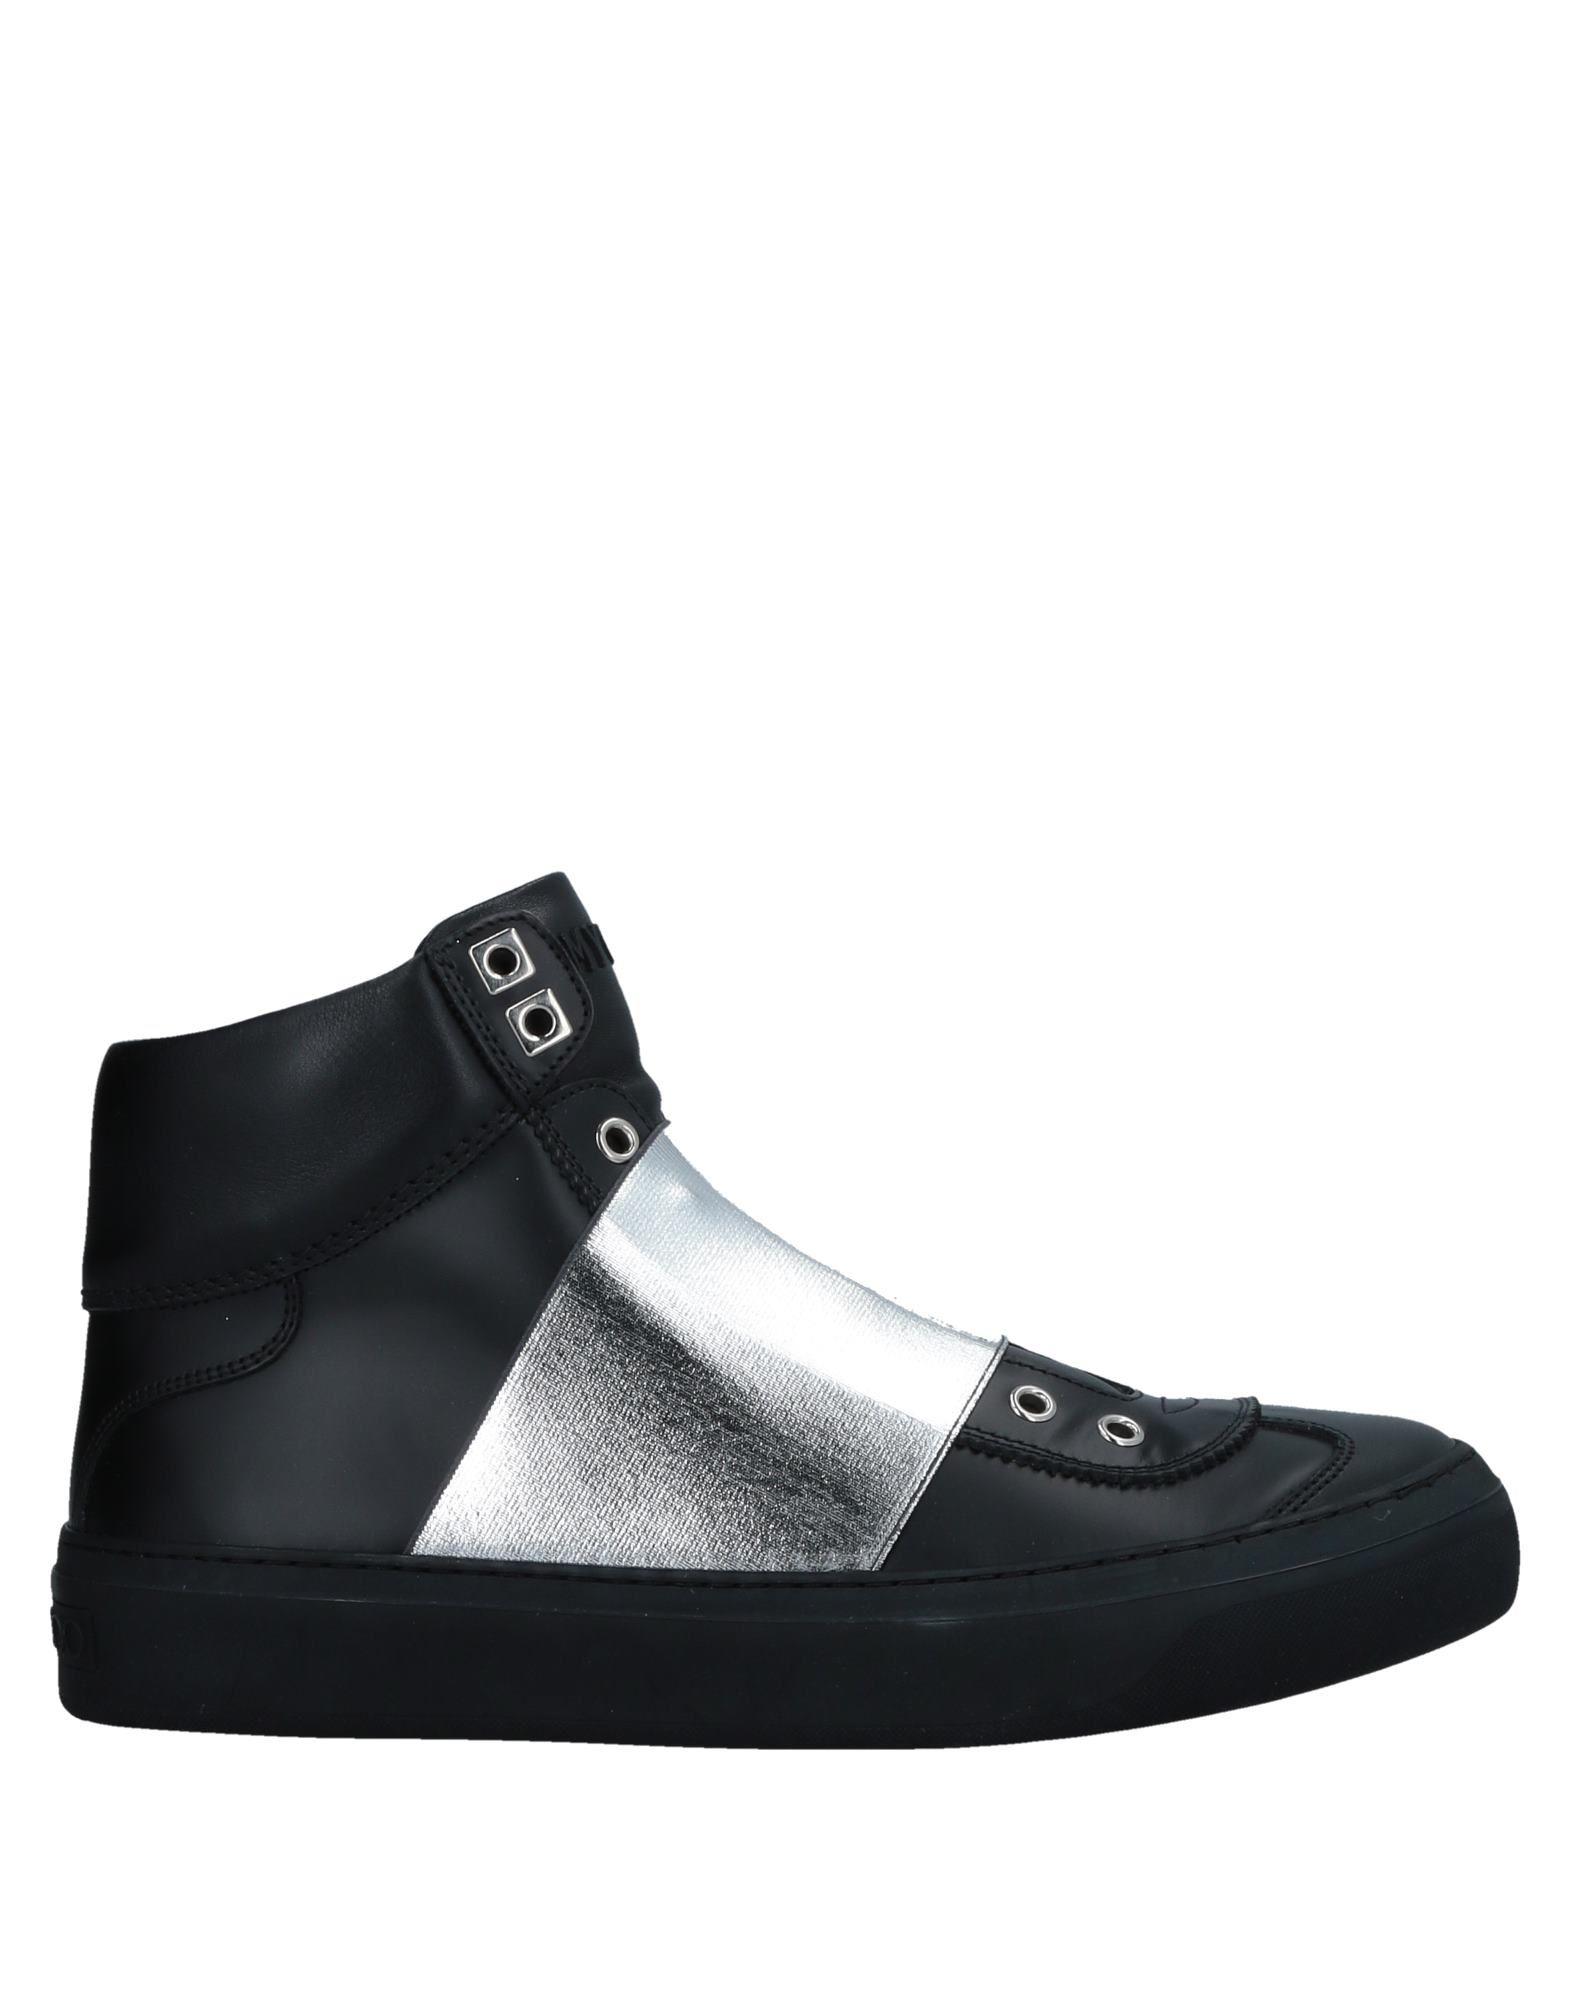 Jimmy Choo Sneakers Damen  11528859XHGünstige gut aussehende Schuhe